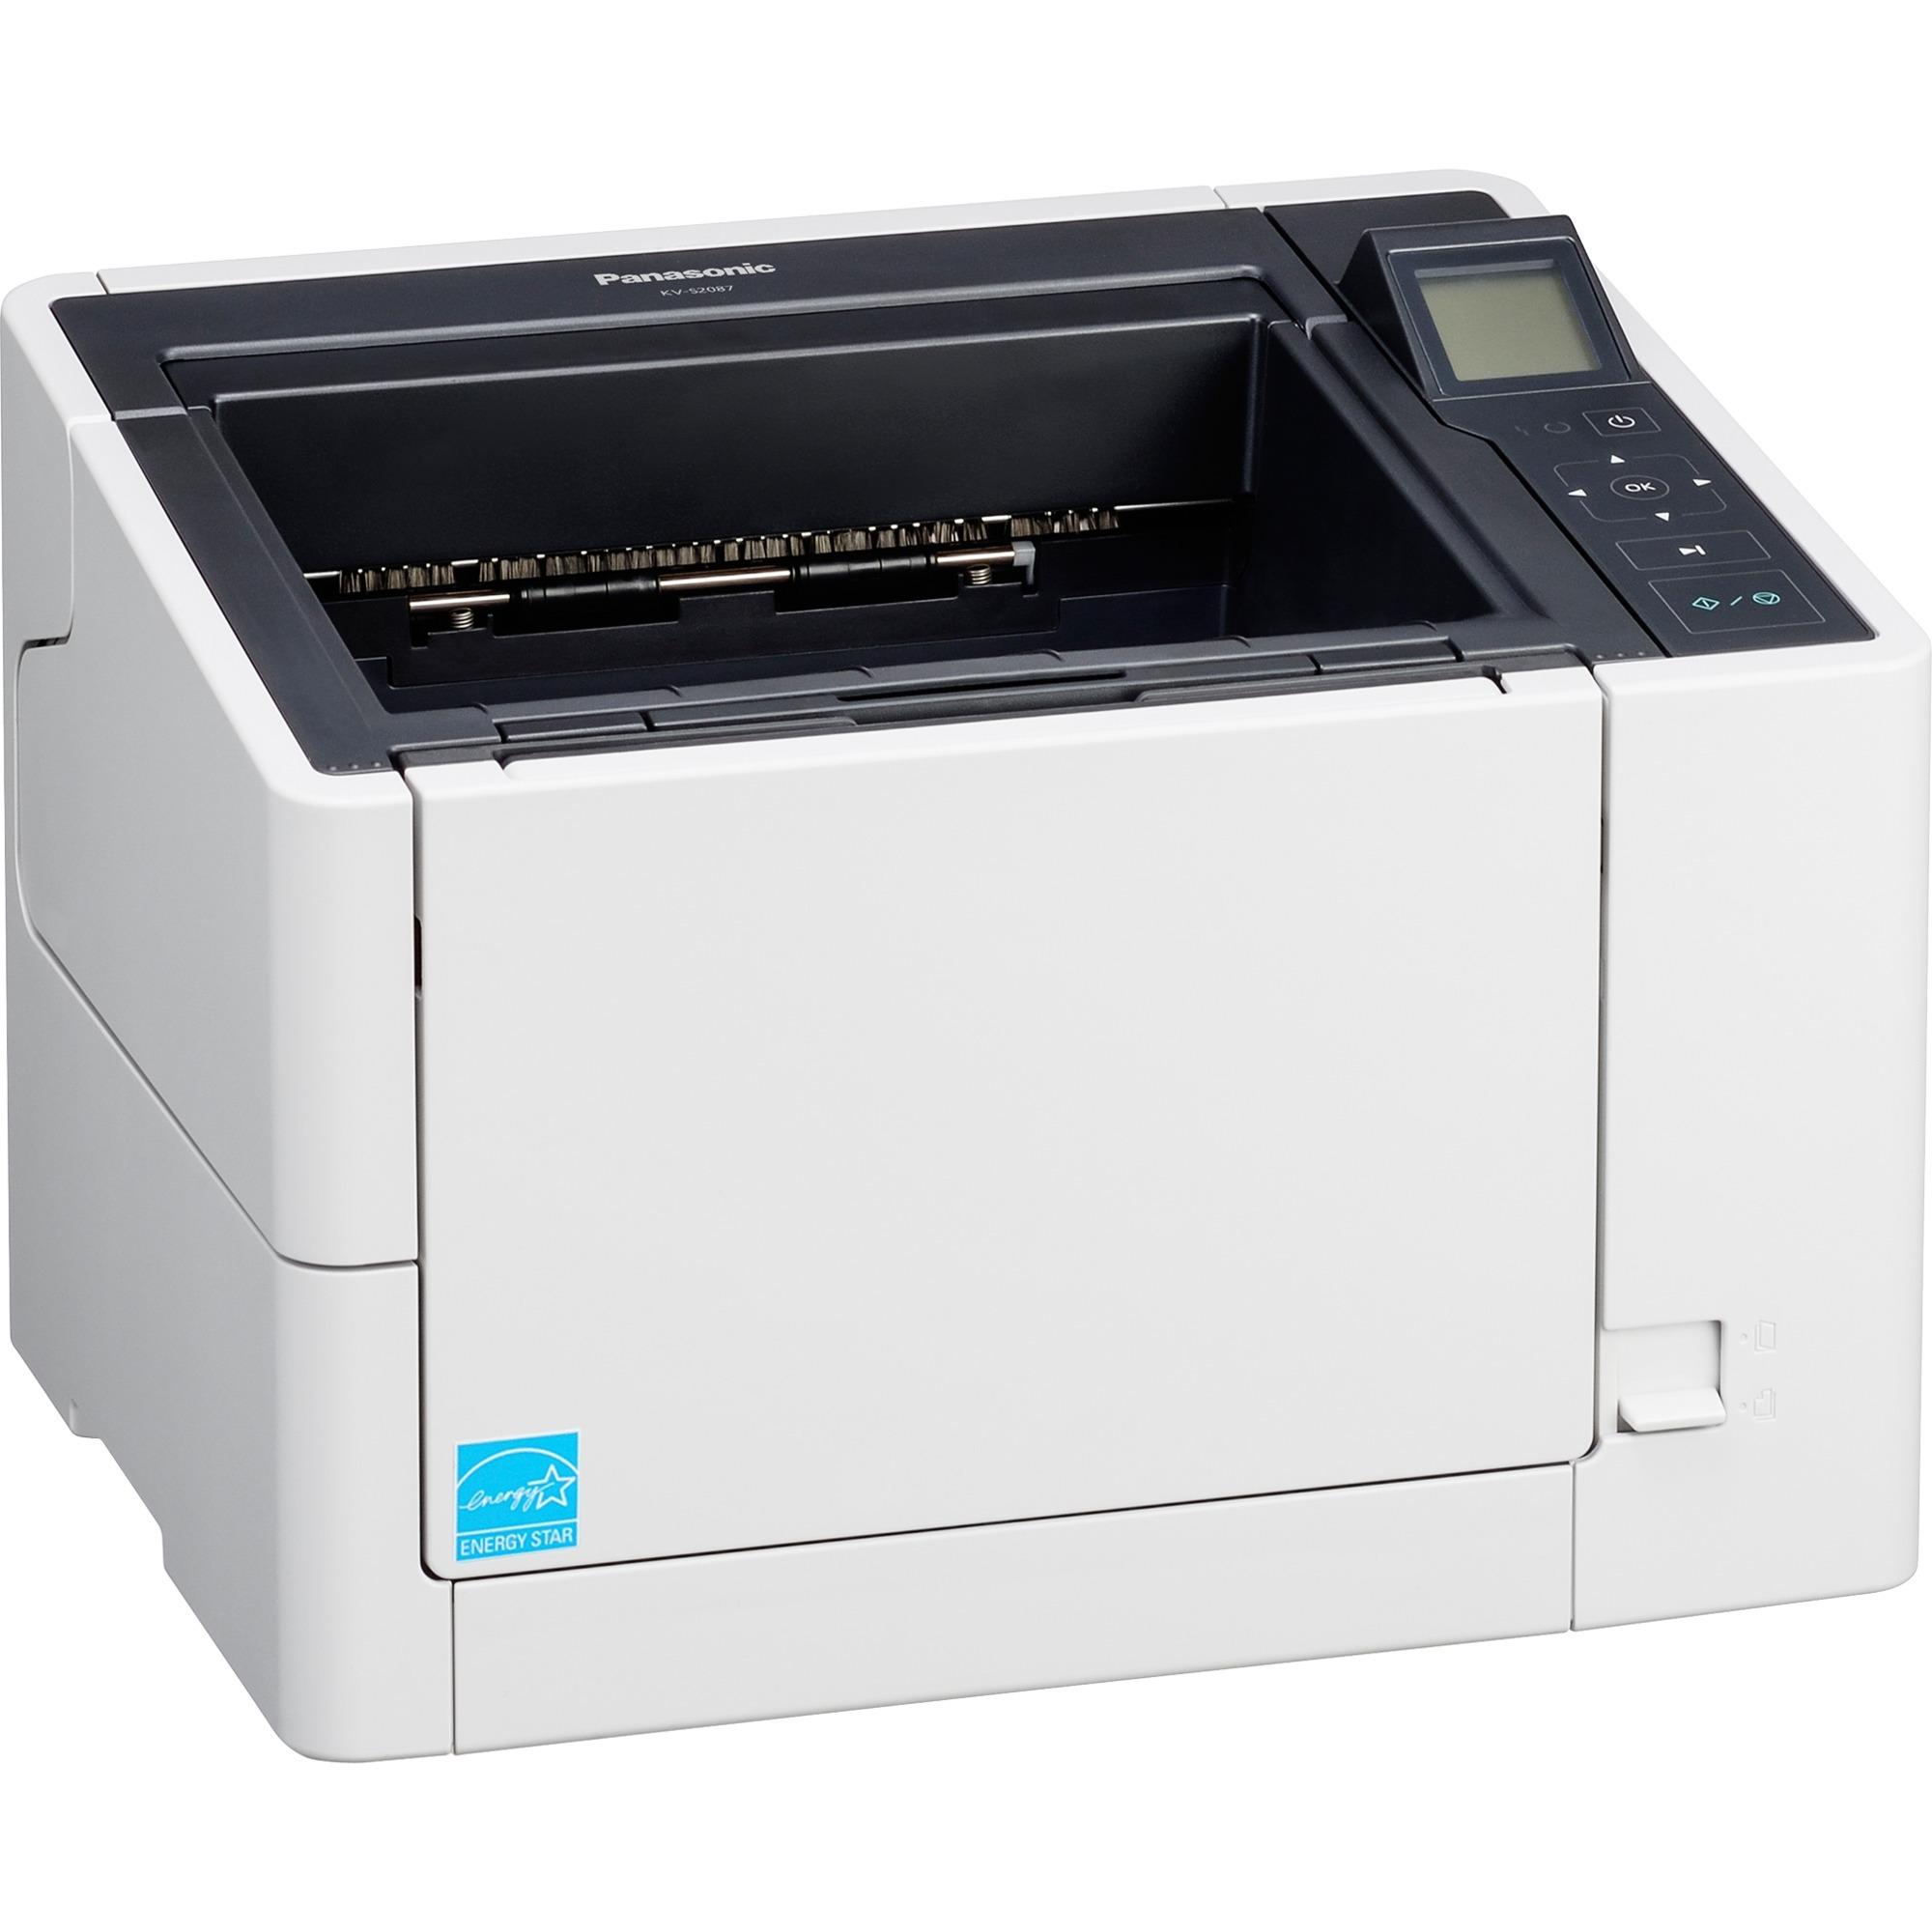 KV-S2087-U ADF scanner 600 x 600DPI A4 Noir, Blanc scanner